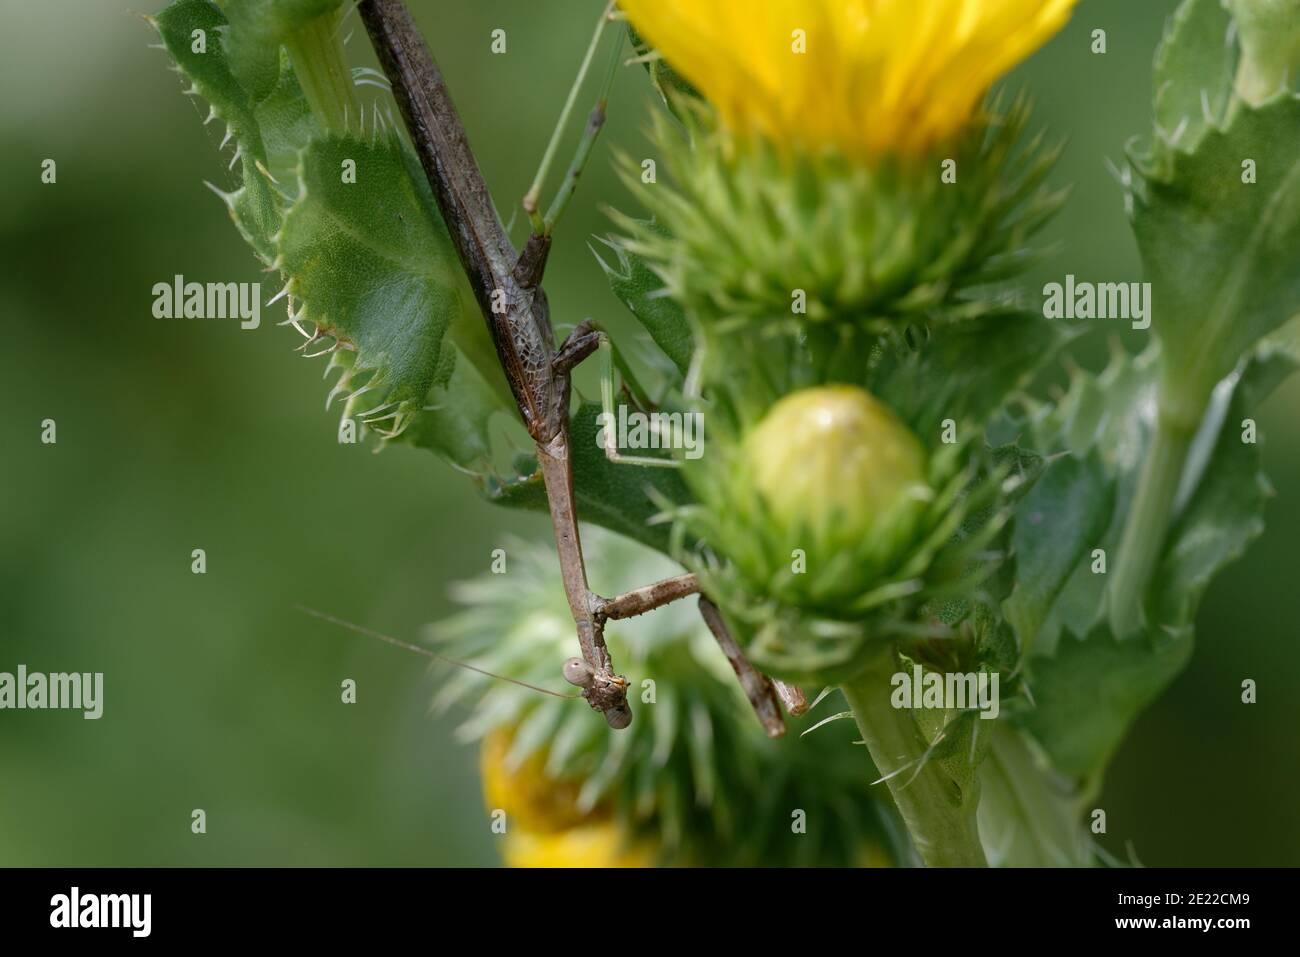 Saw-Leaf Daisy with praying mantis Stock Photo